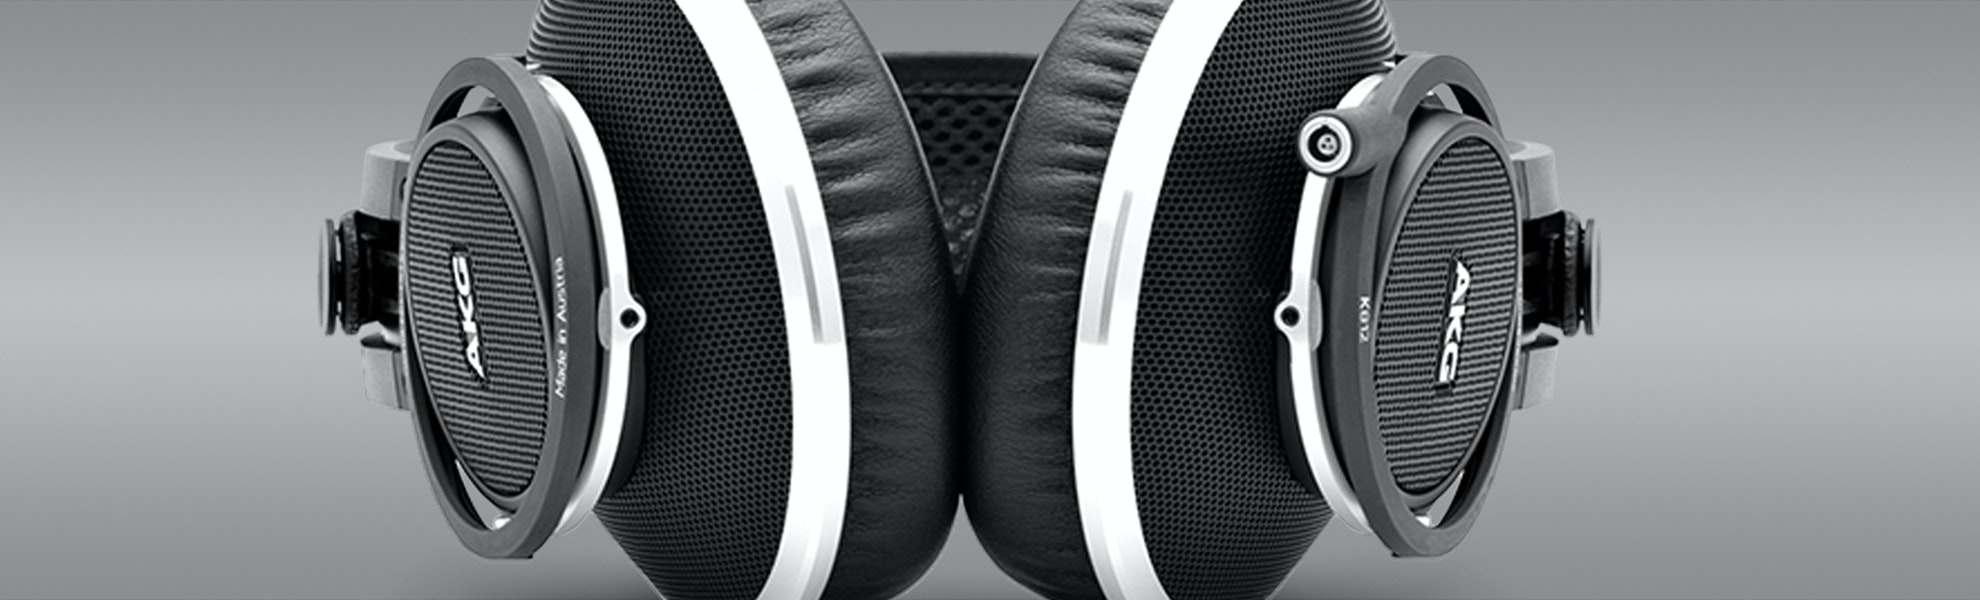 AKG K812 Reference Headphone